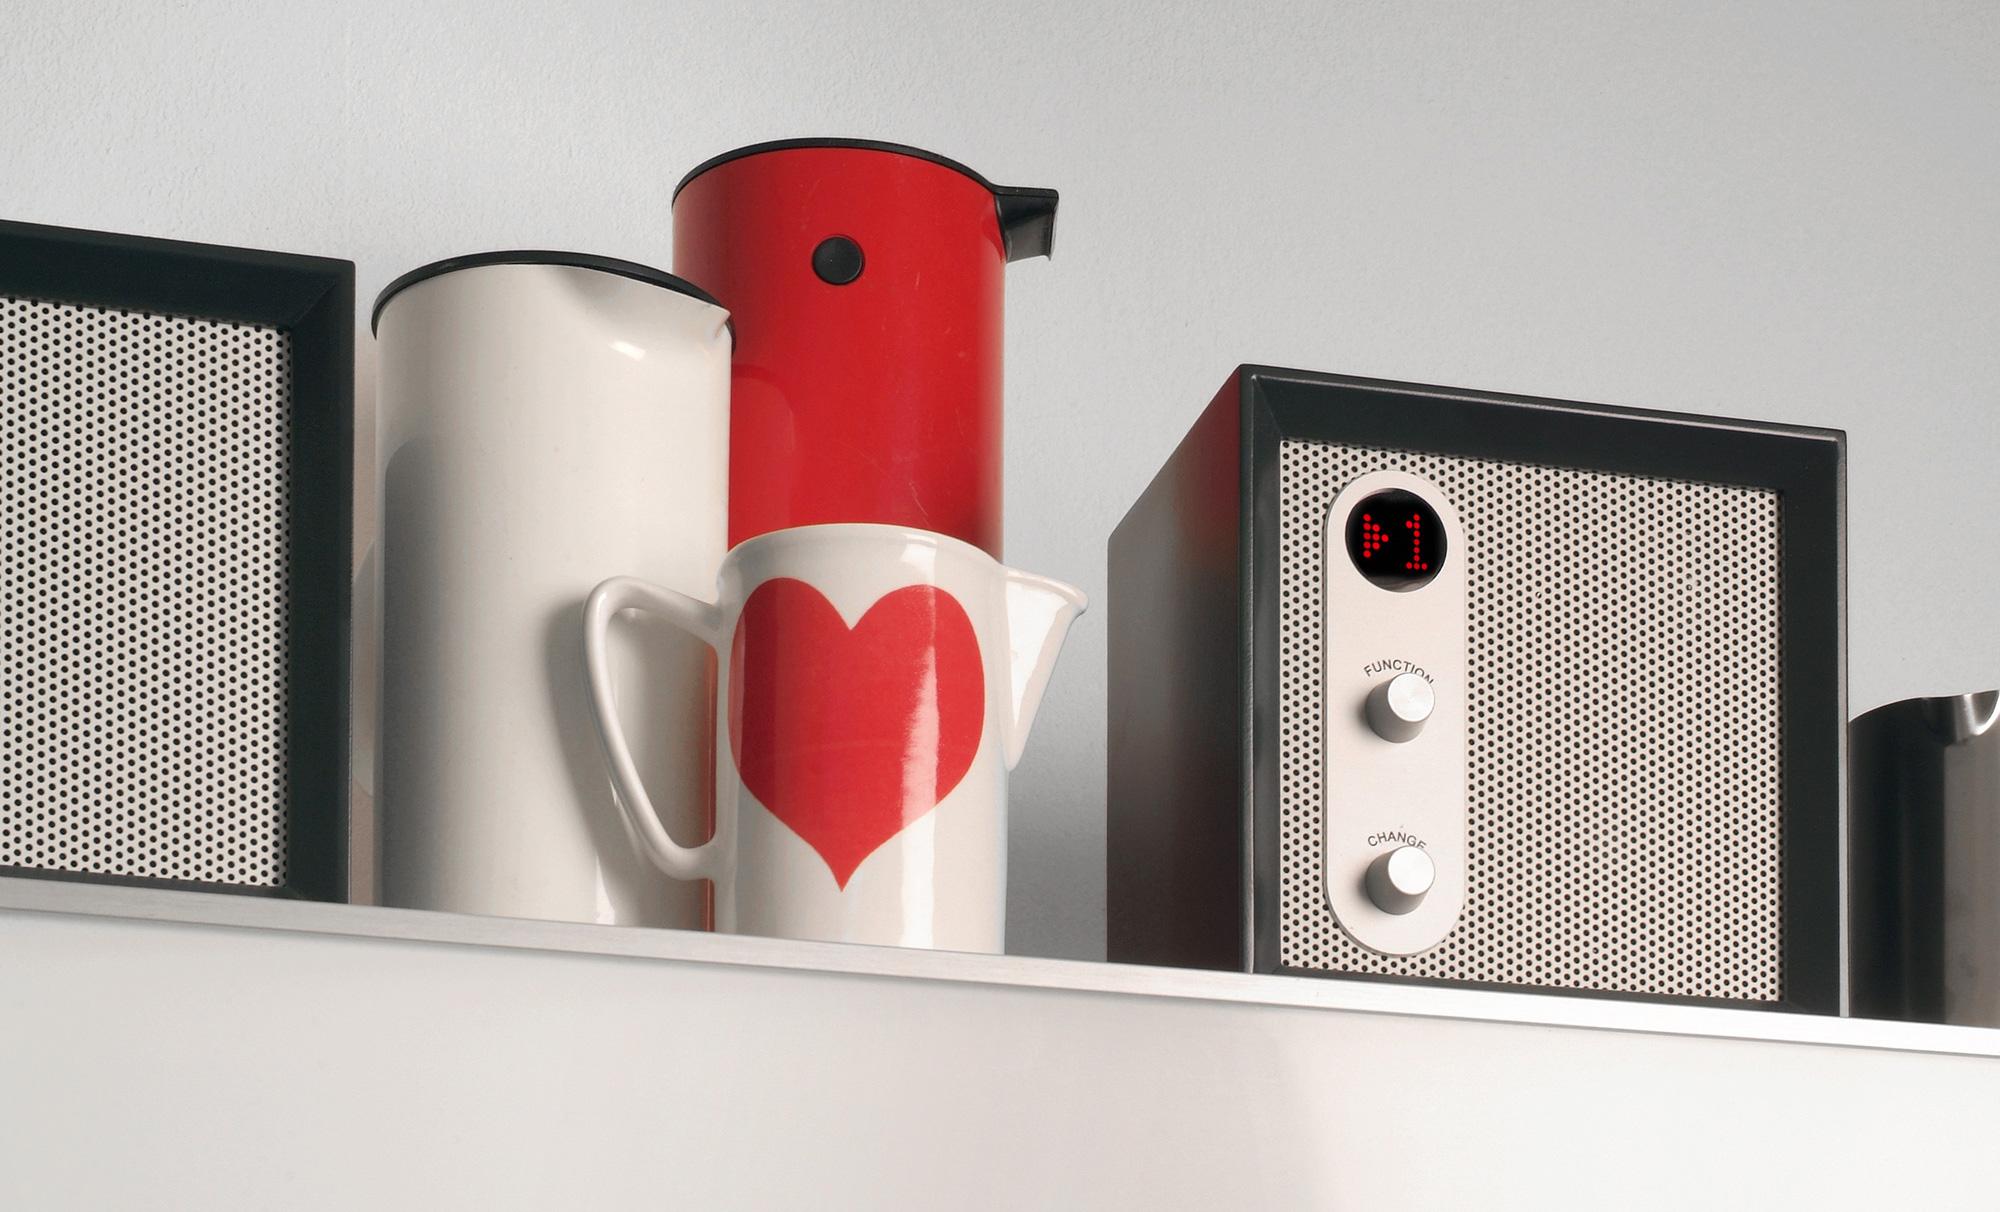 Set-Lautsprecher-radio-sonos-fotos-neu-berlin-innovation